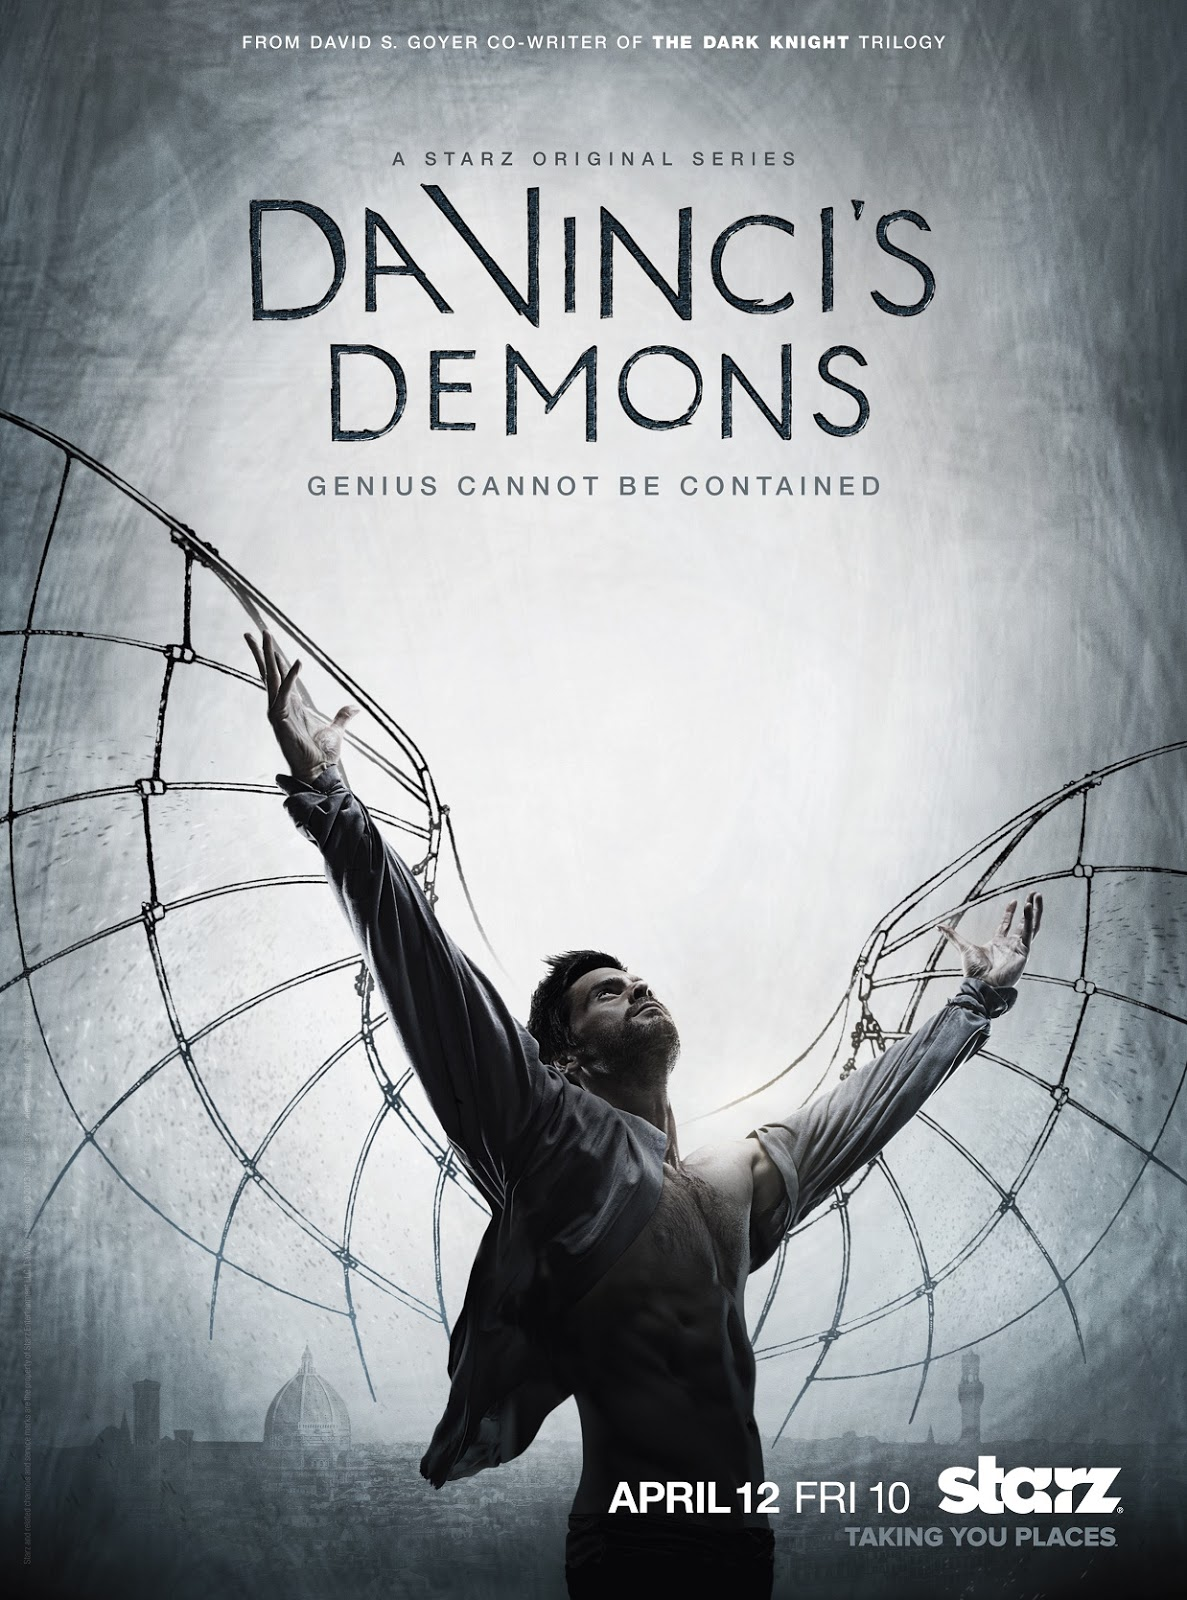 Finale:Game of Thrones(season 3) and Da Vinci's Demons(season 1